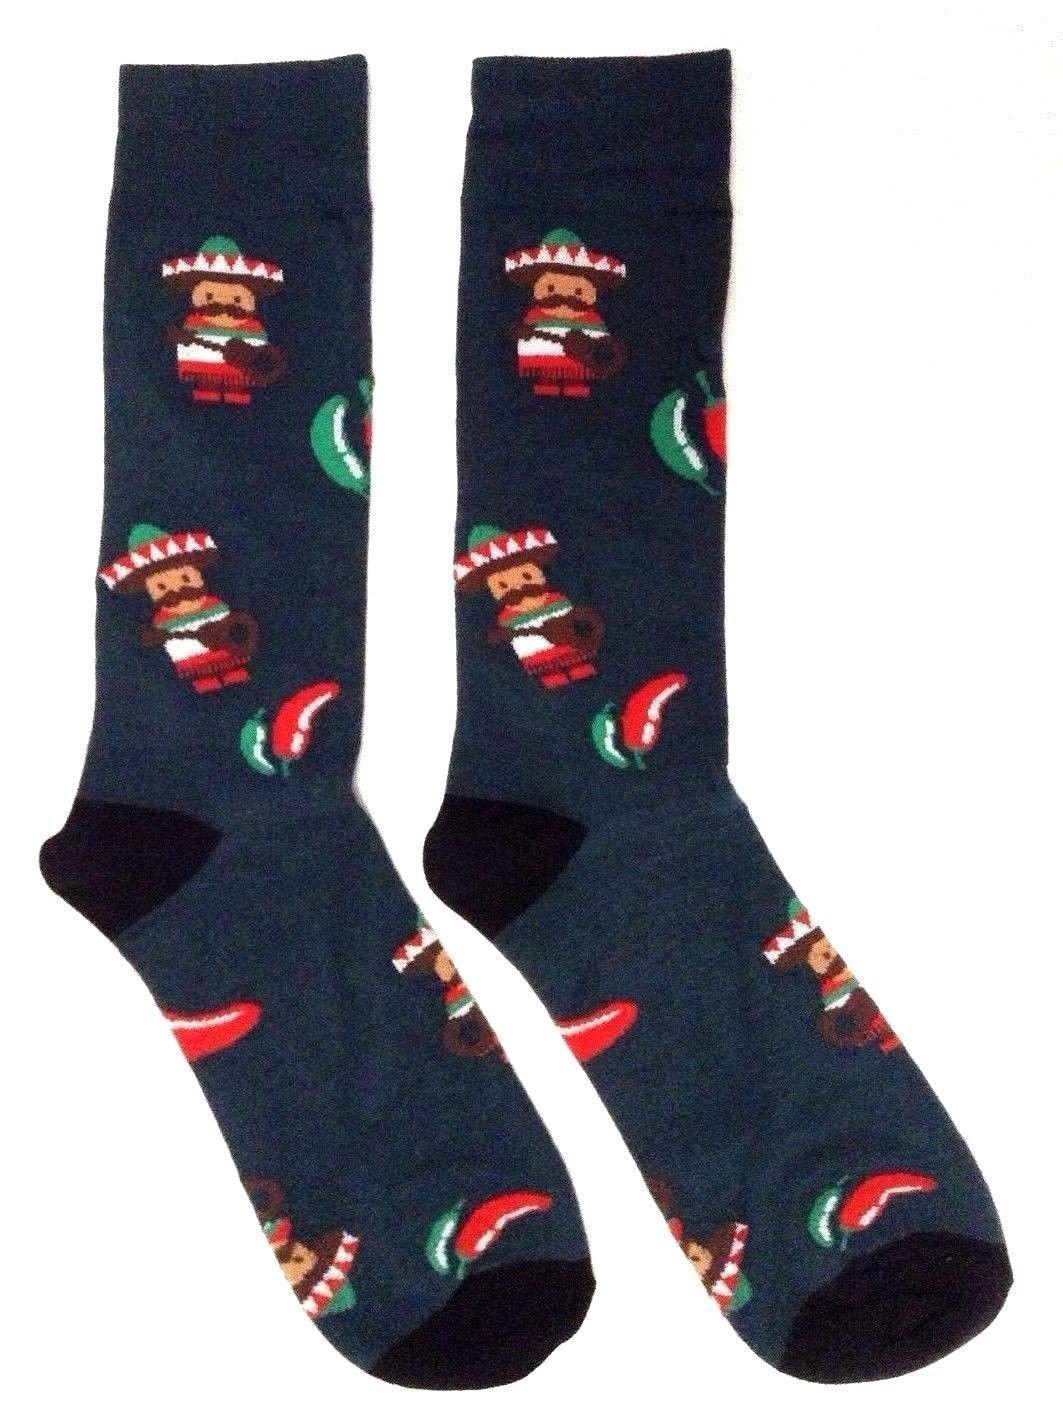 Novelty Fine Fit Crew Socks - Mix Prints (Green Mariachi Chili Pepper)